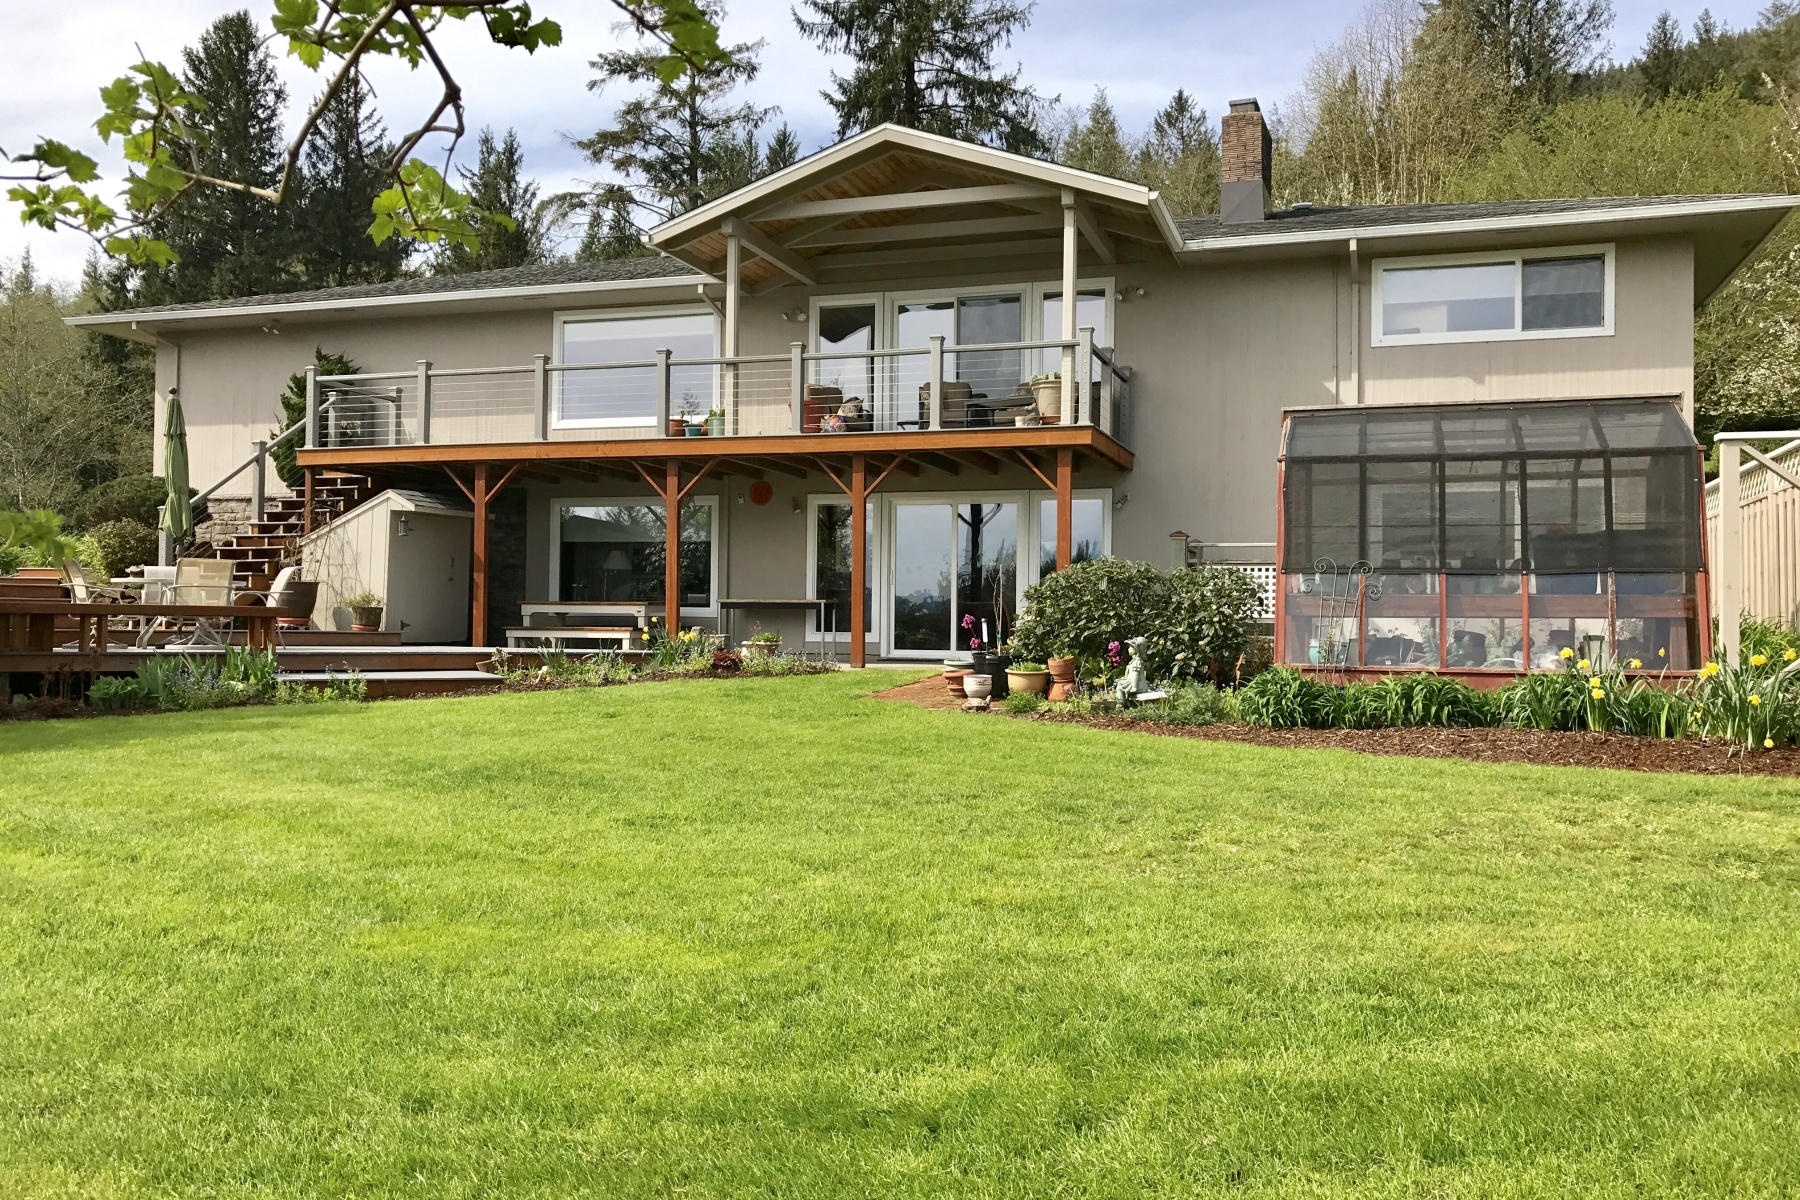 Single Family Home for Sale at 3455 NORTHWOOD WAY, TILLAMOOK, OR Tillamook, Oregon, 97141 United States